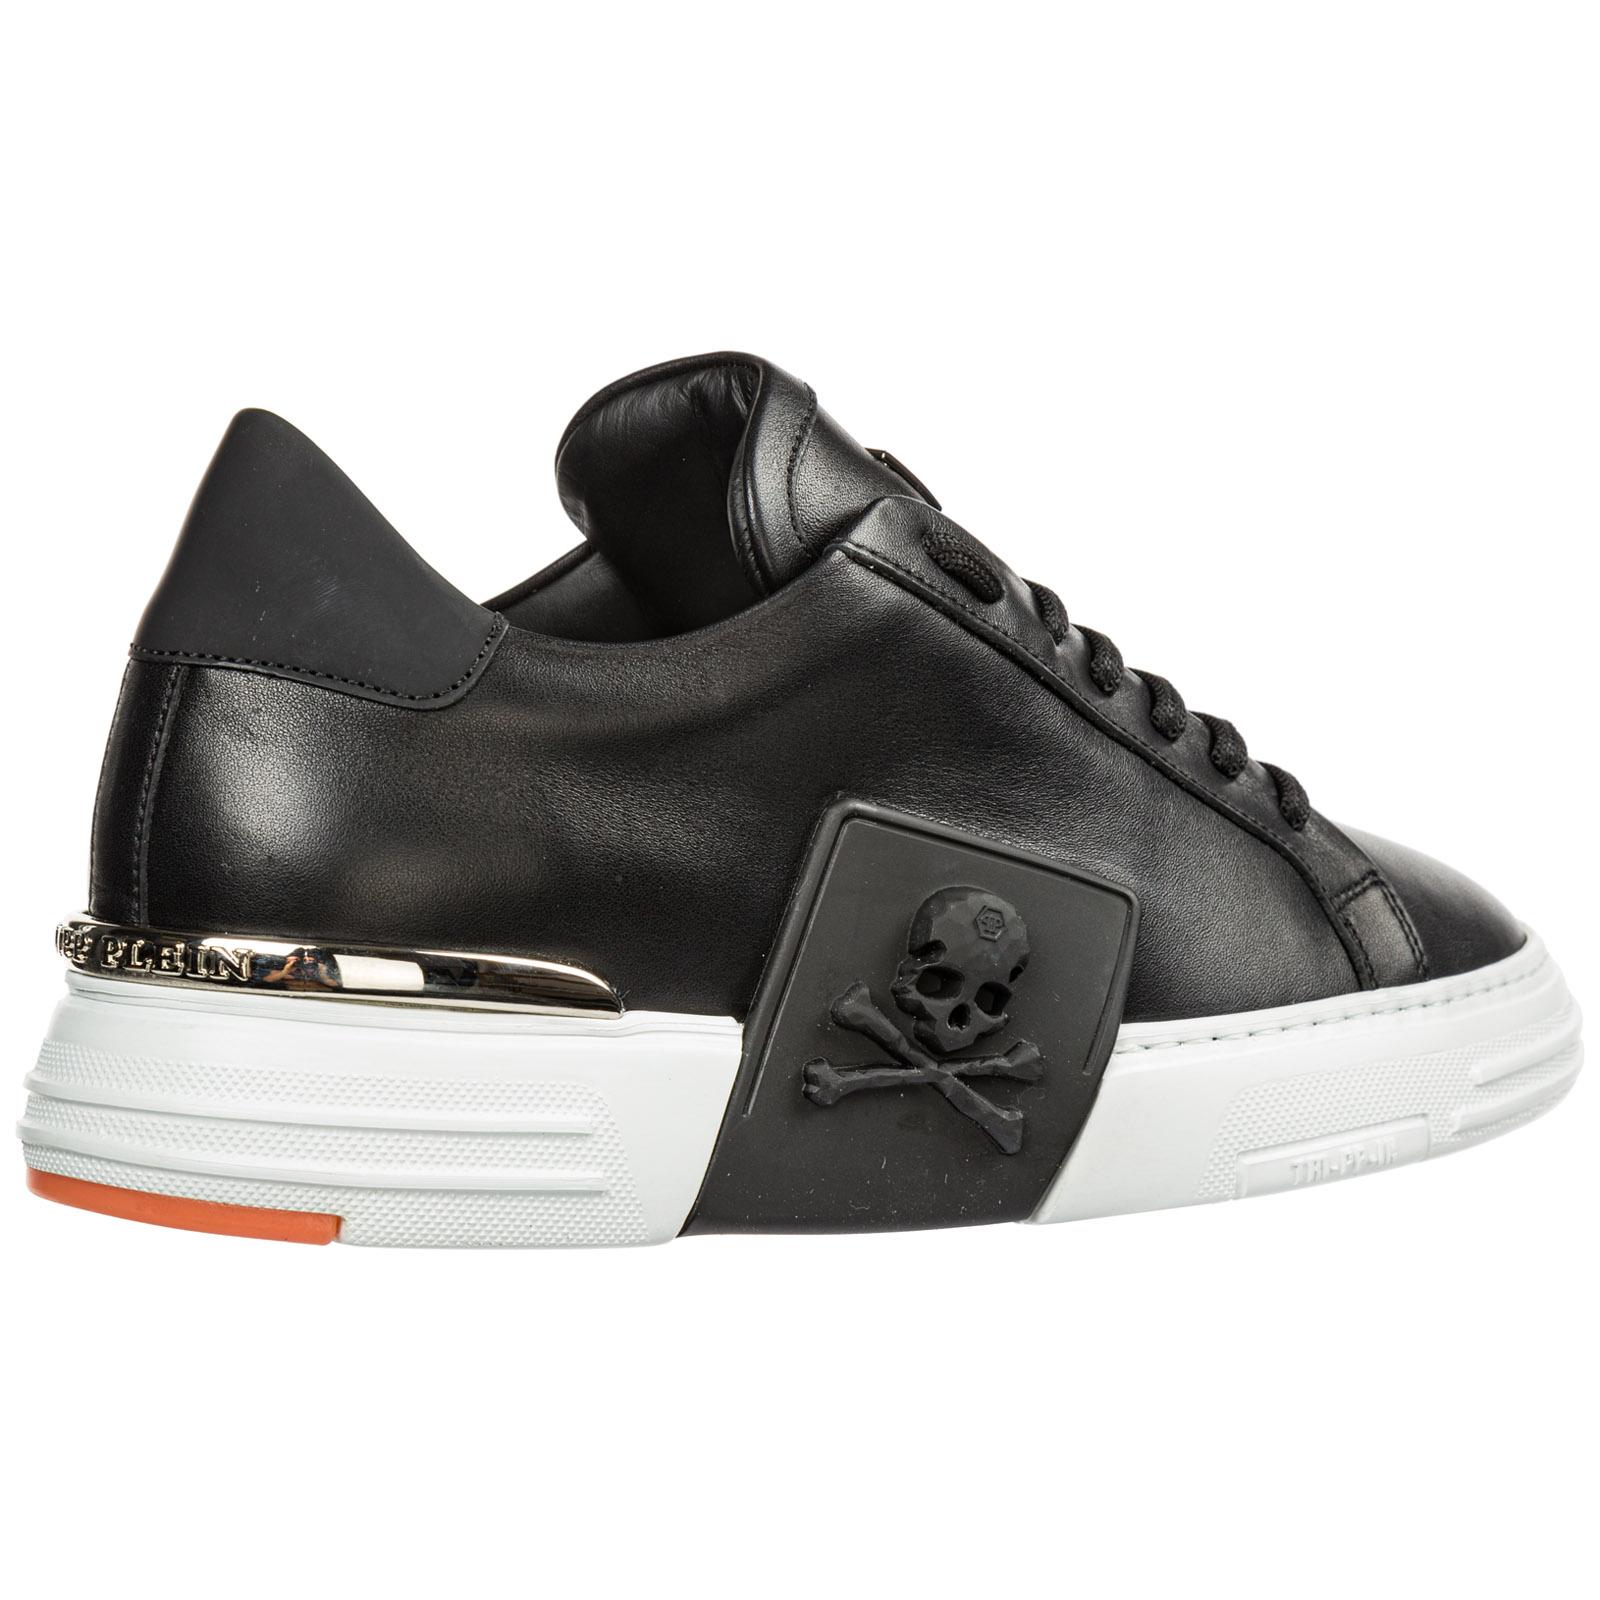 Sneakers Philipp Plein Phantom Kick